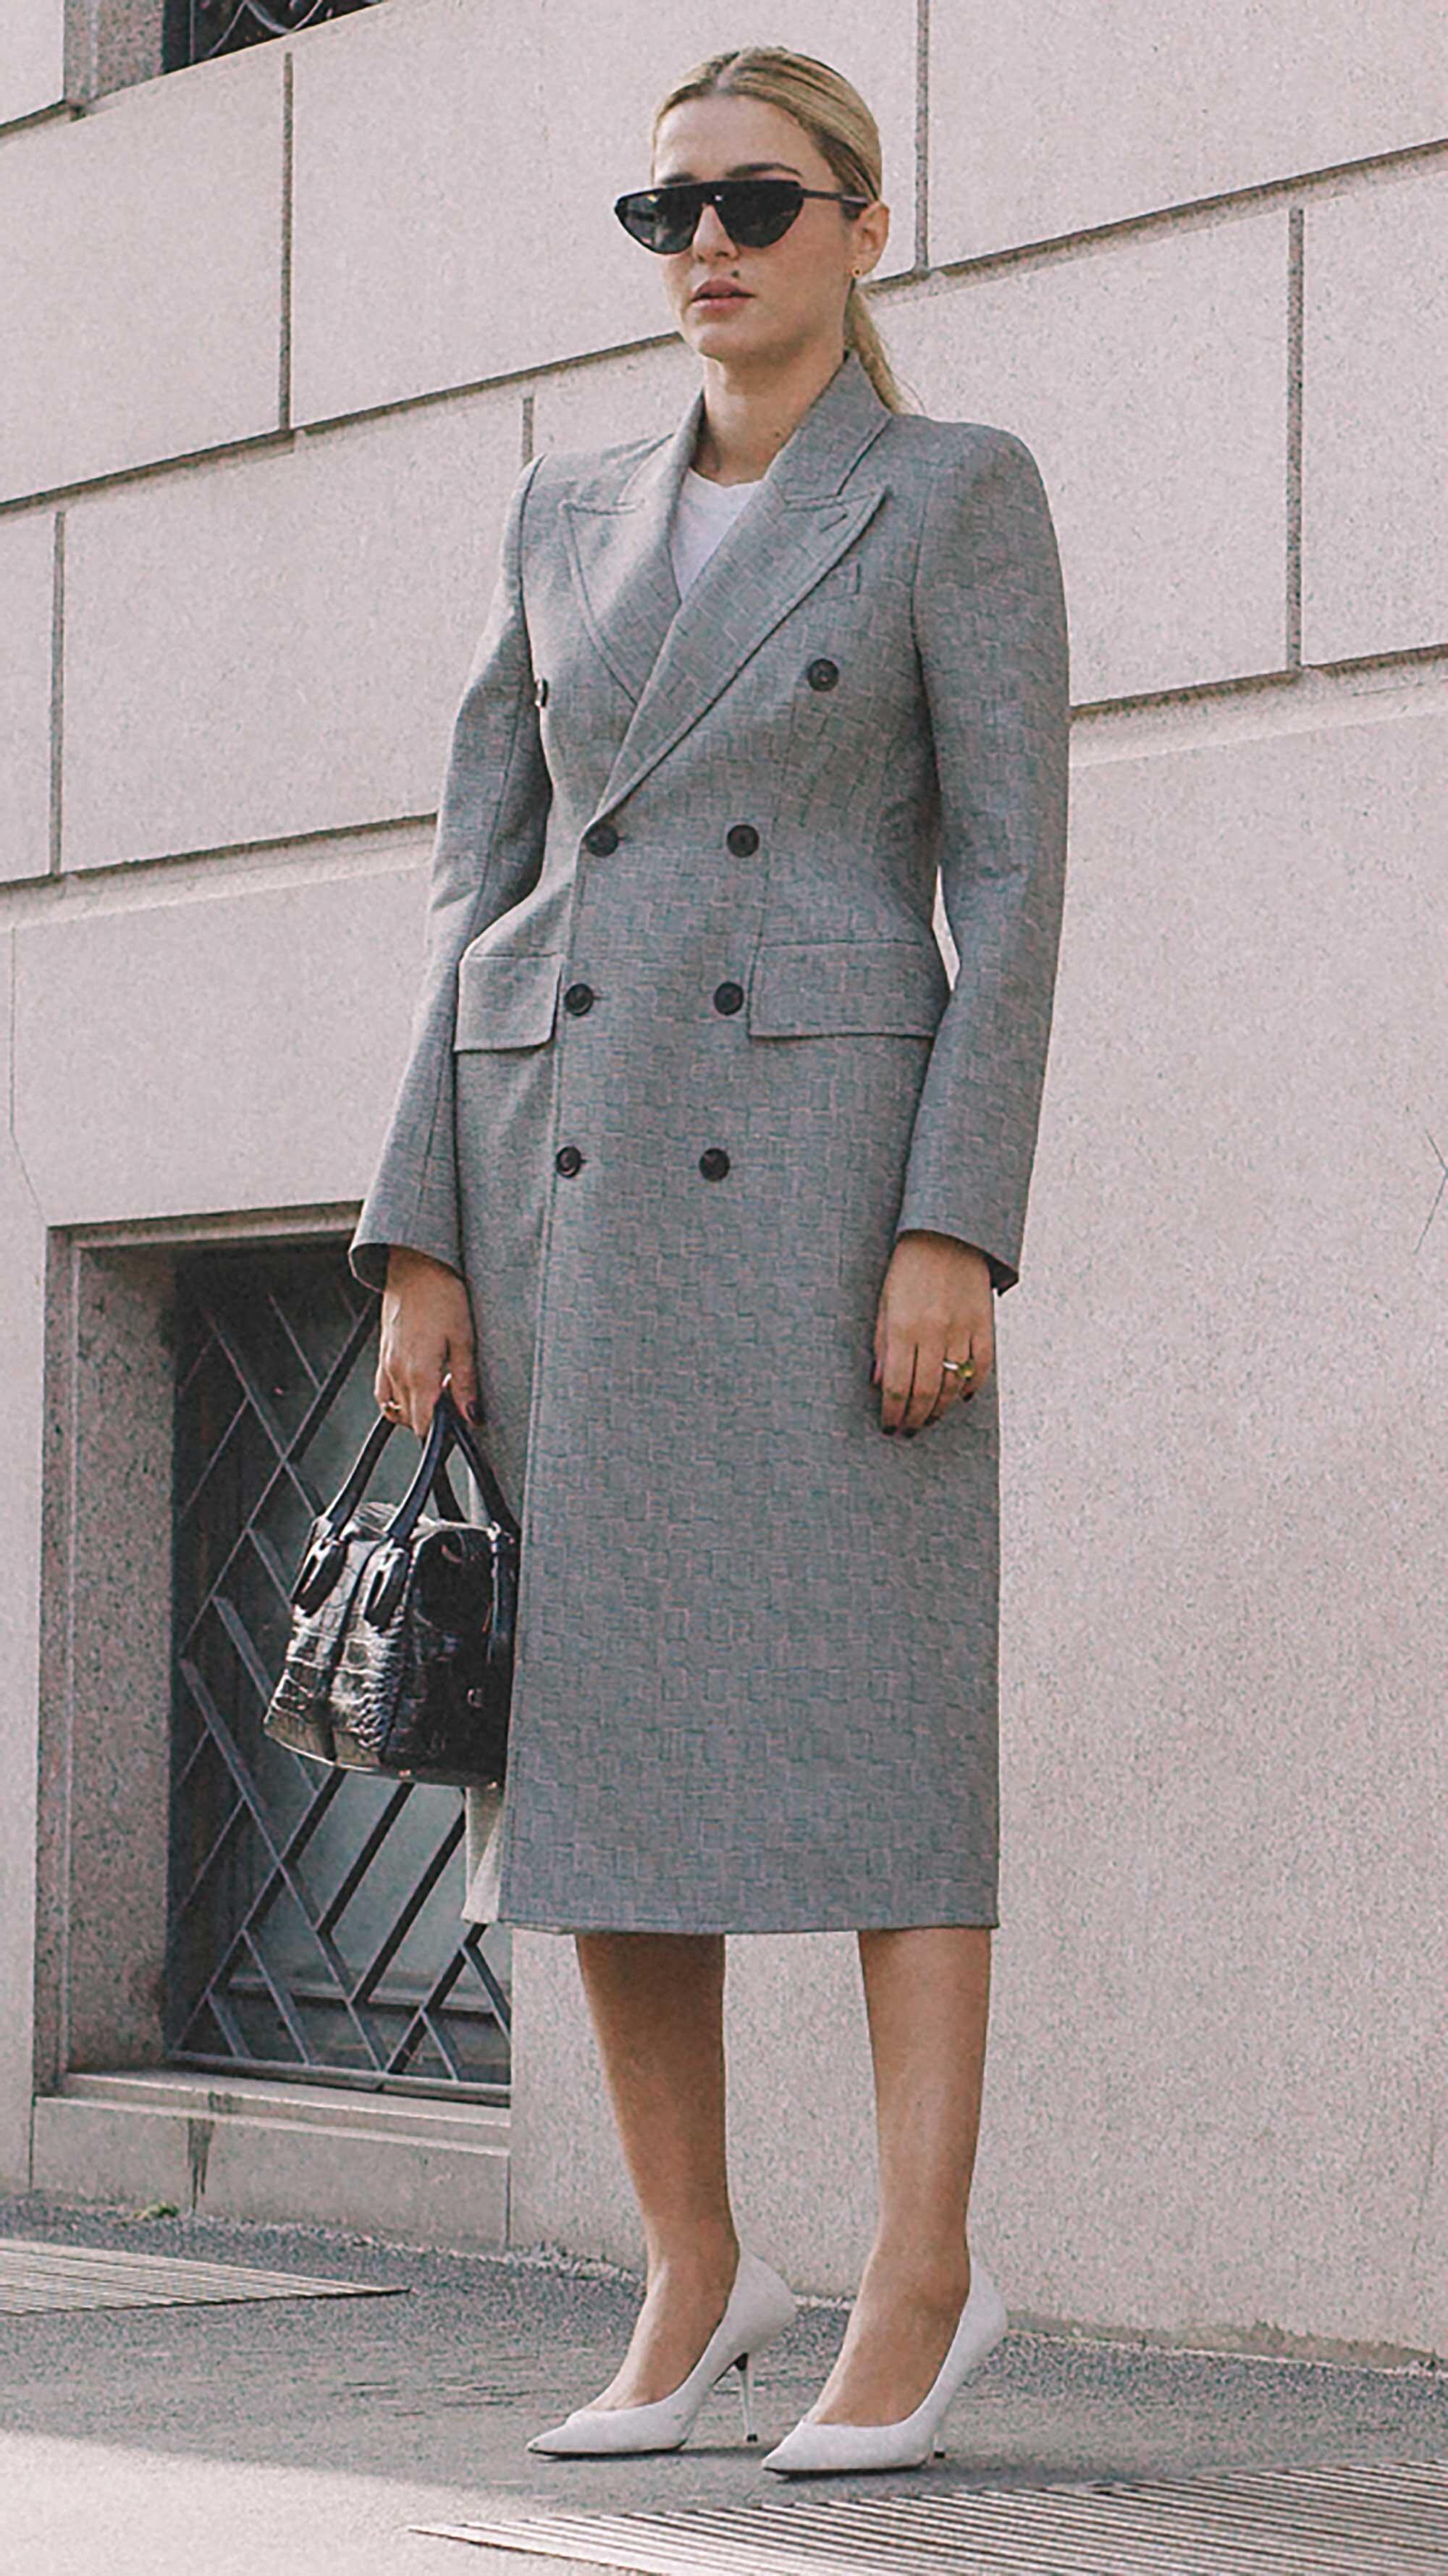 Best outfits of Milan Fashion Week street style 2019 day three MFW SS20 Photo by @J2martinez -29.jpg